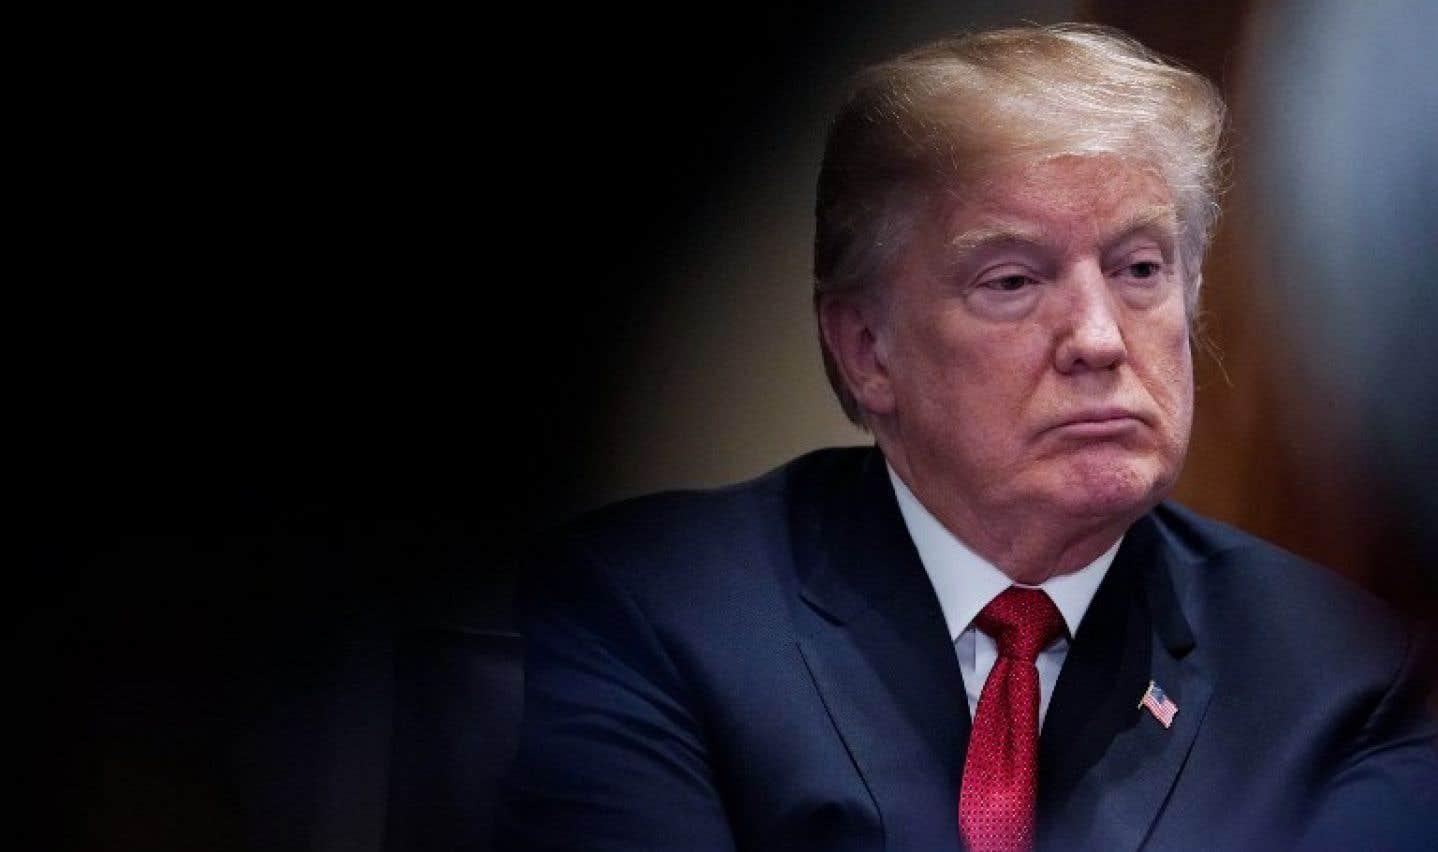 Trump met en garde contre «les fausses accusations»